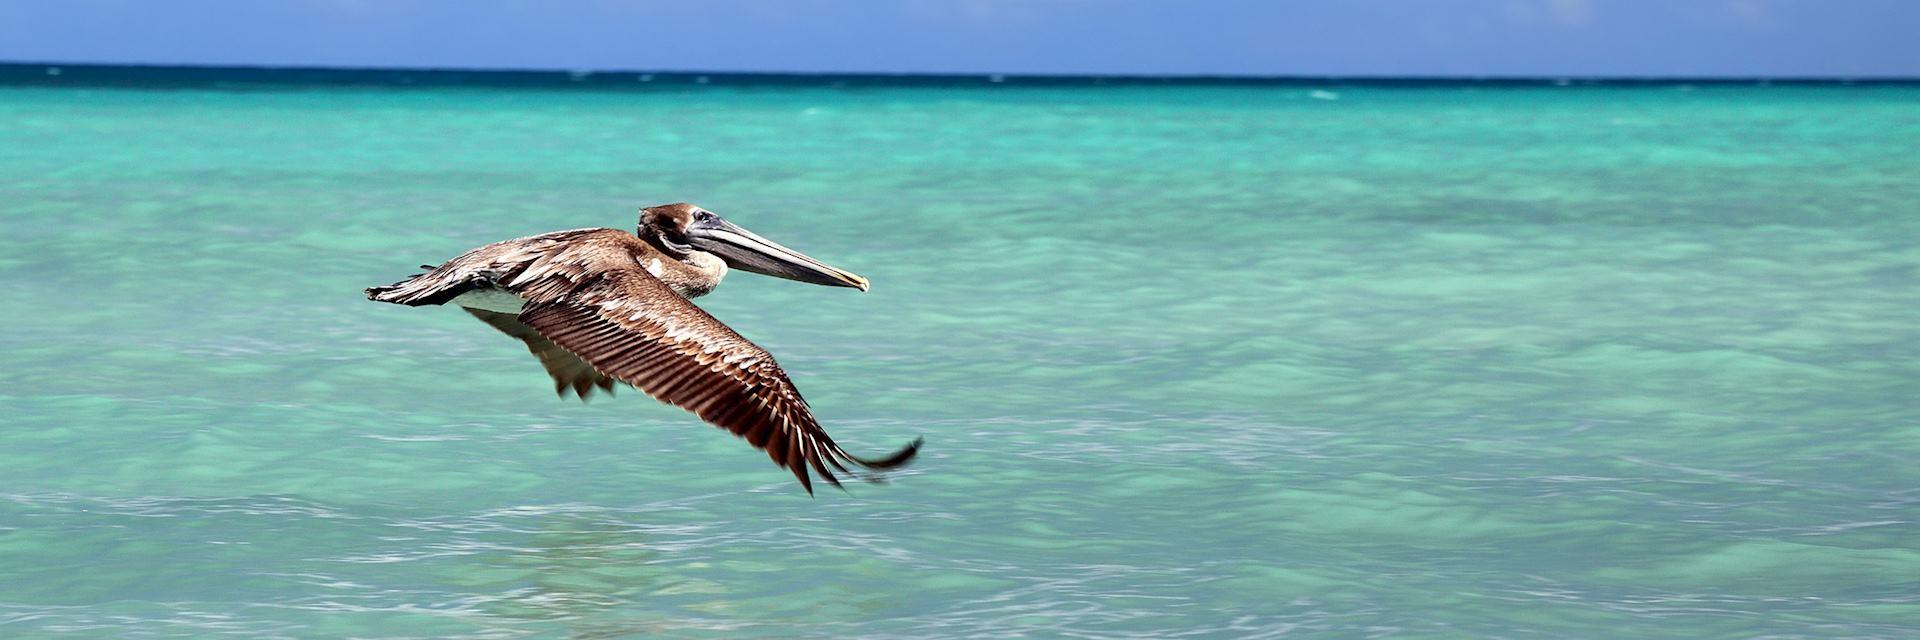 Pelican swooping over Varadero beach, Cuba